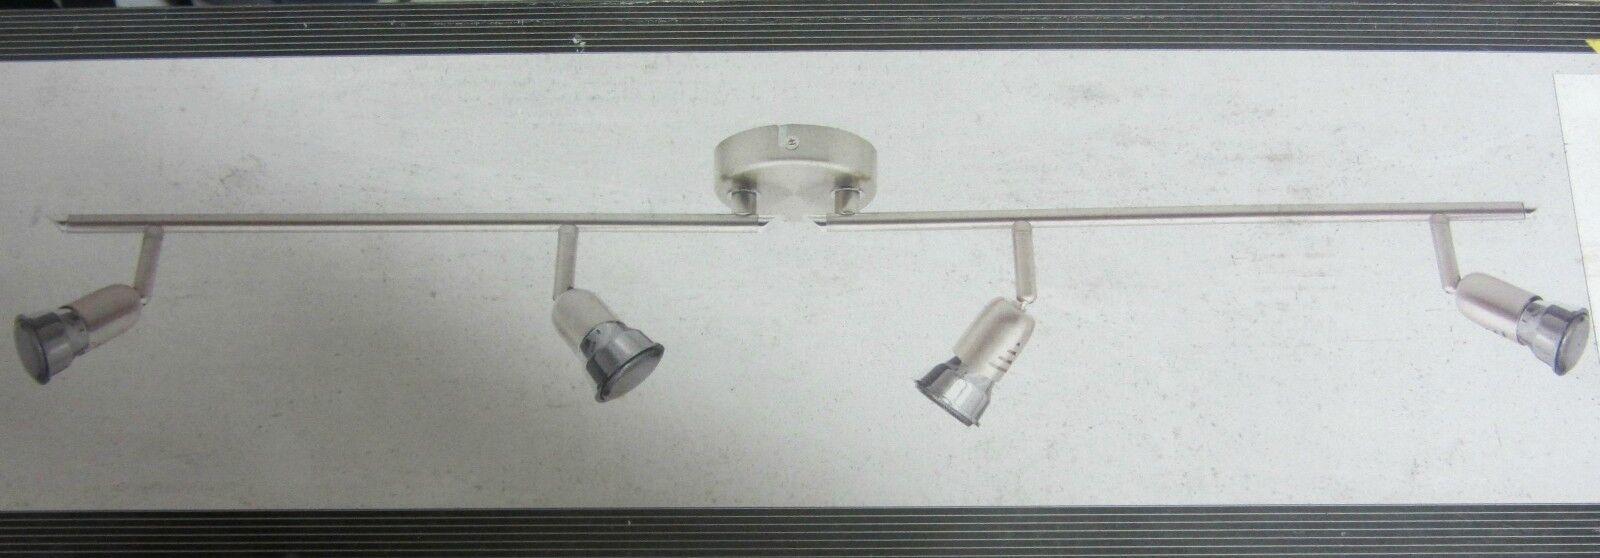 Brilliant G84832 13 Ecos Lampe X Wand Metall Chrom 4 Lichter 50W Neu